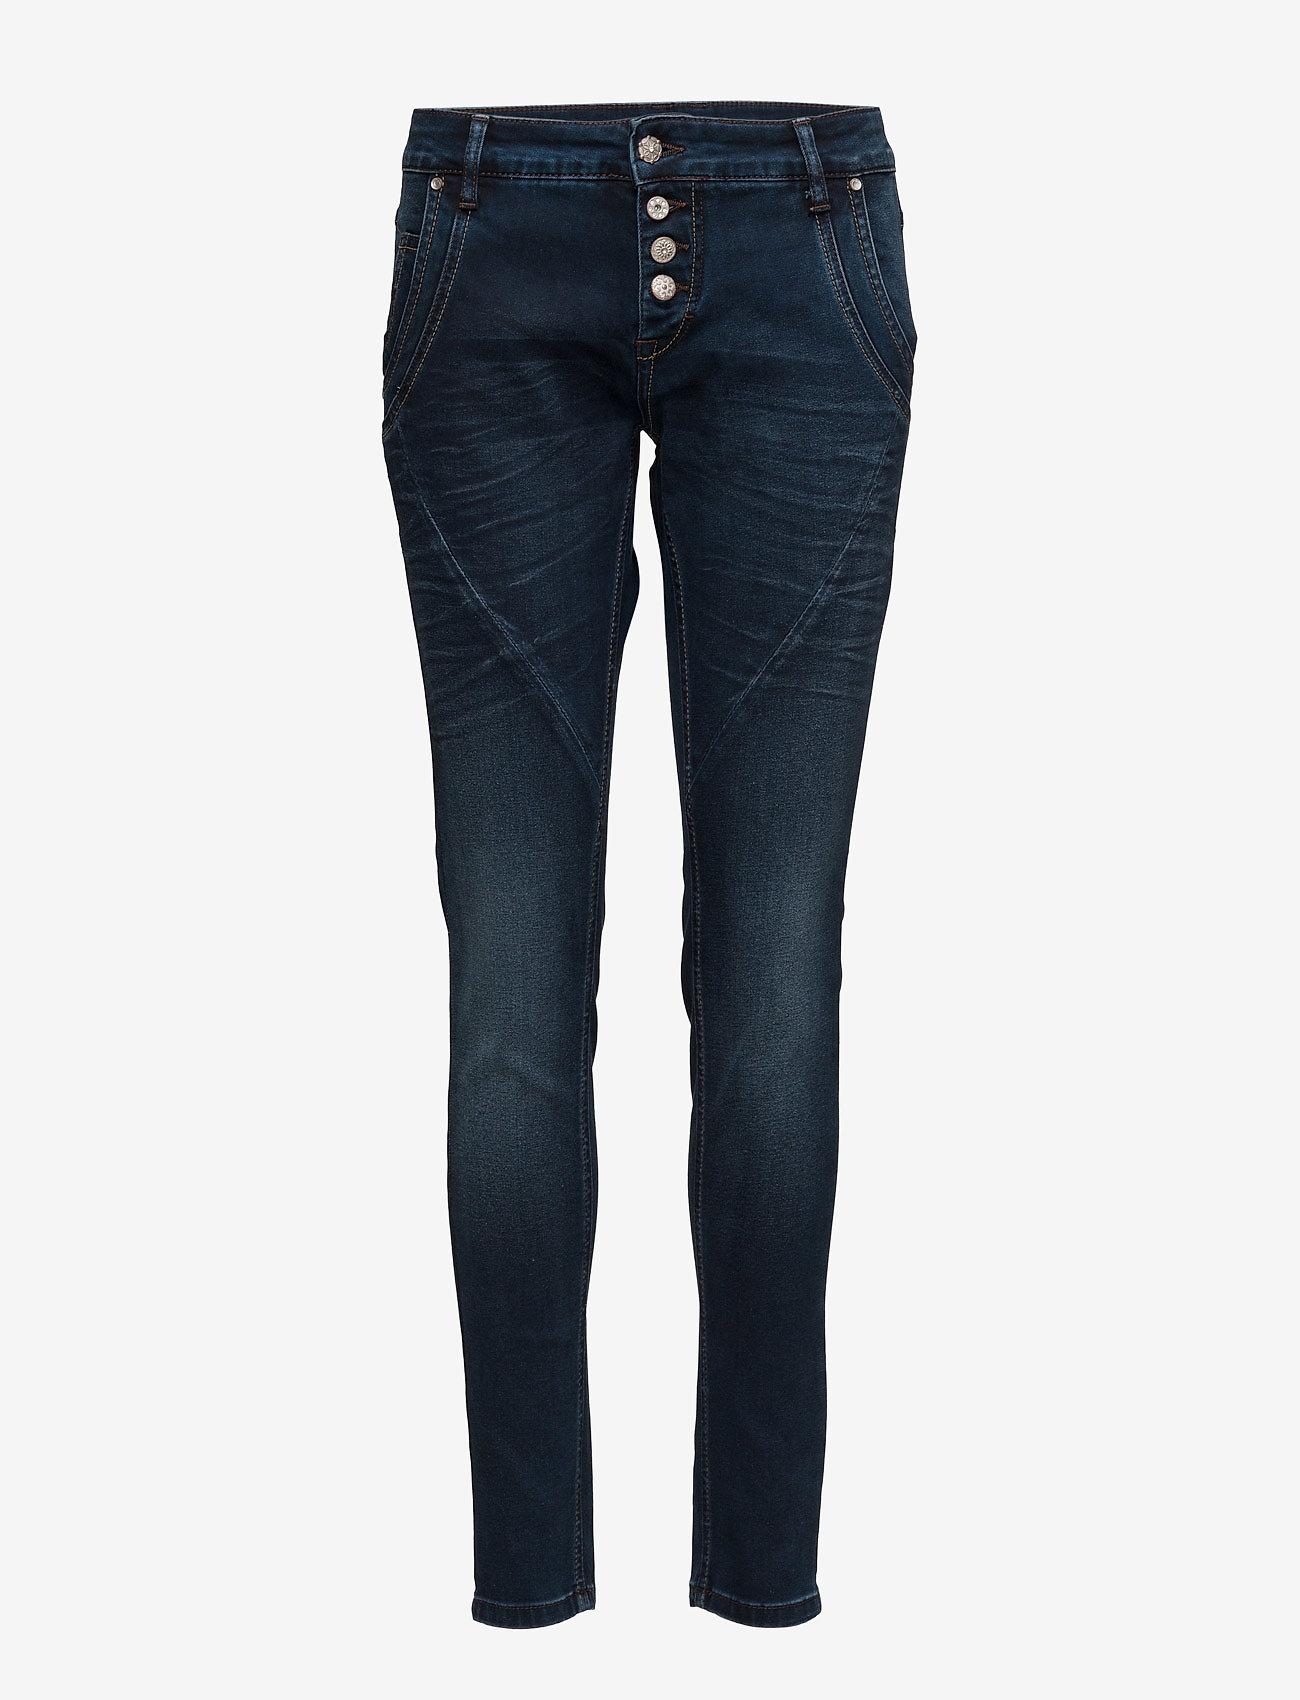 Cream - Baiily Power Stretch Jeans - džinsa bikses ar šaurām starām - dark blue denim - 0